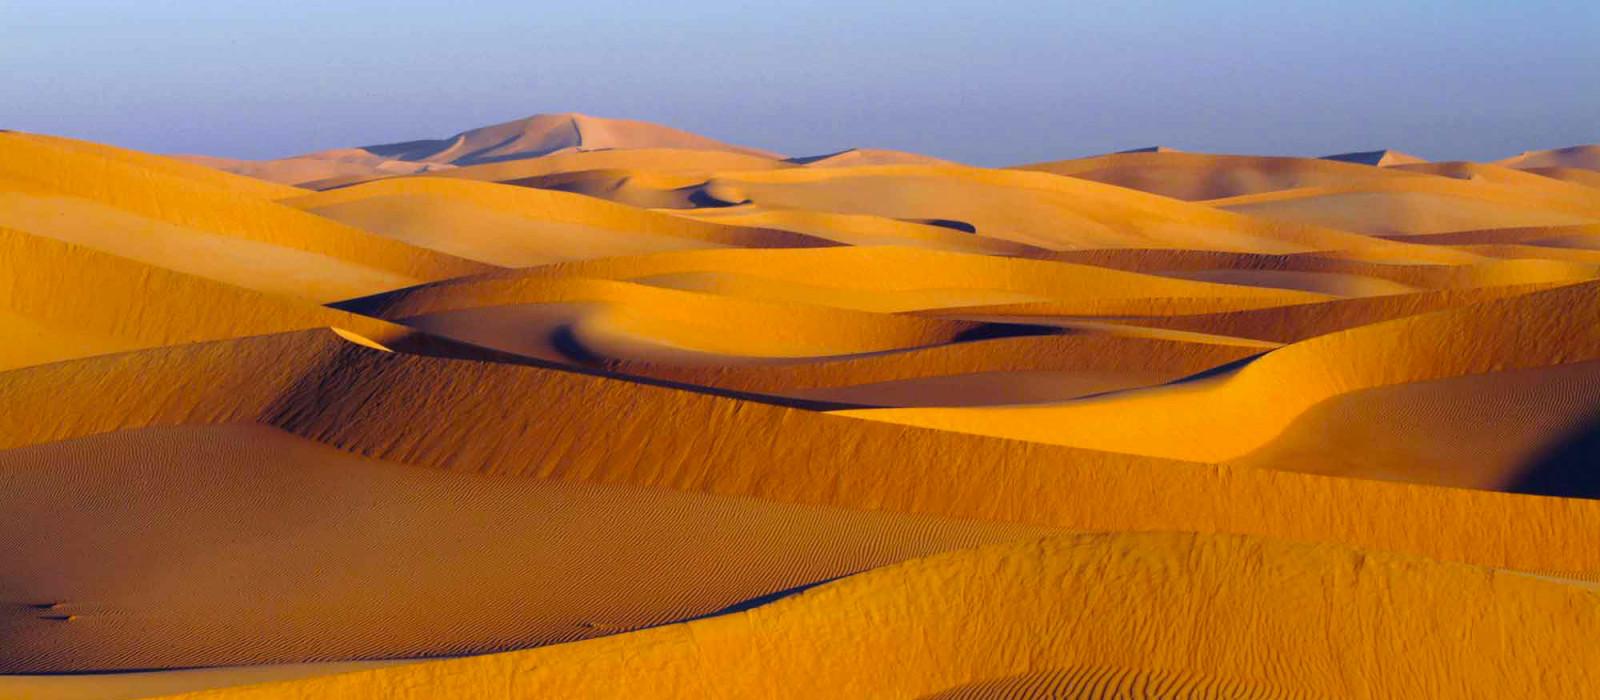 Reiseziel Wahiba Sands (Rimal Al Wahiba) Oman